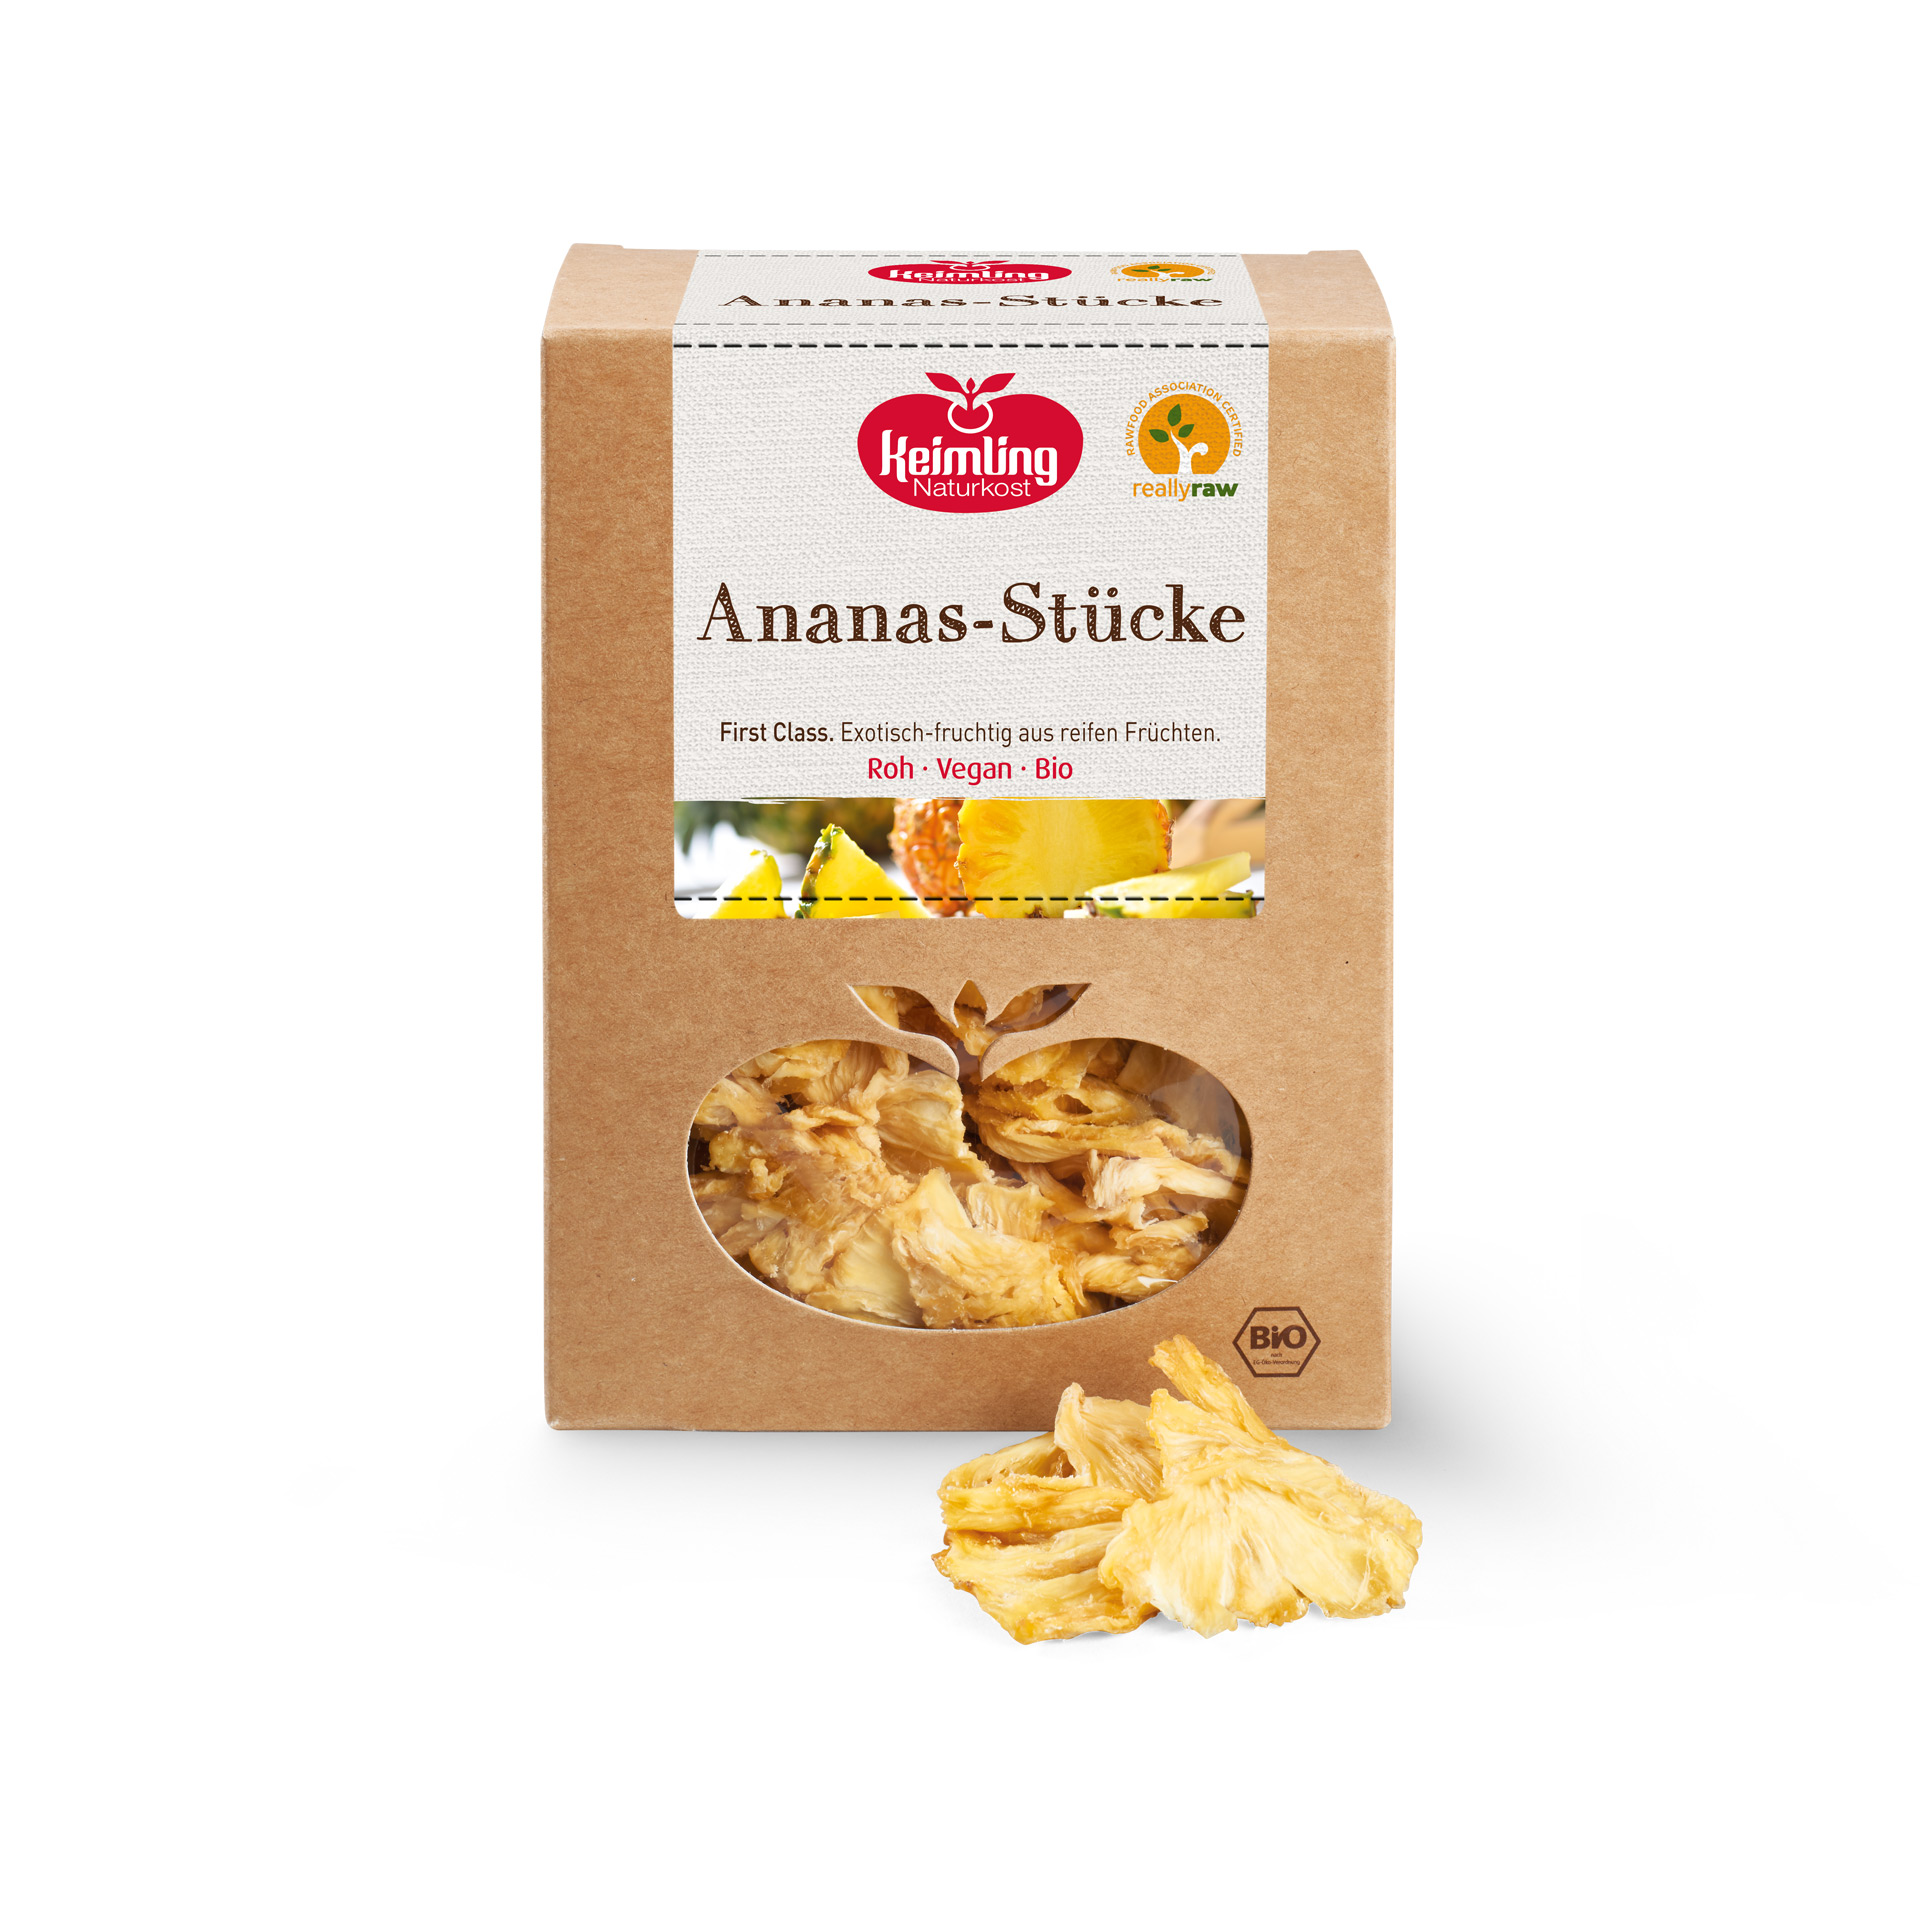 Ananas-Stücke First Class 200 g